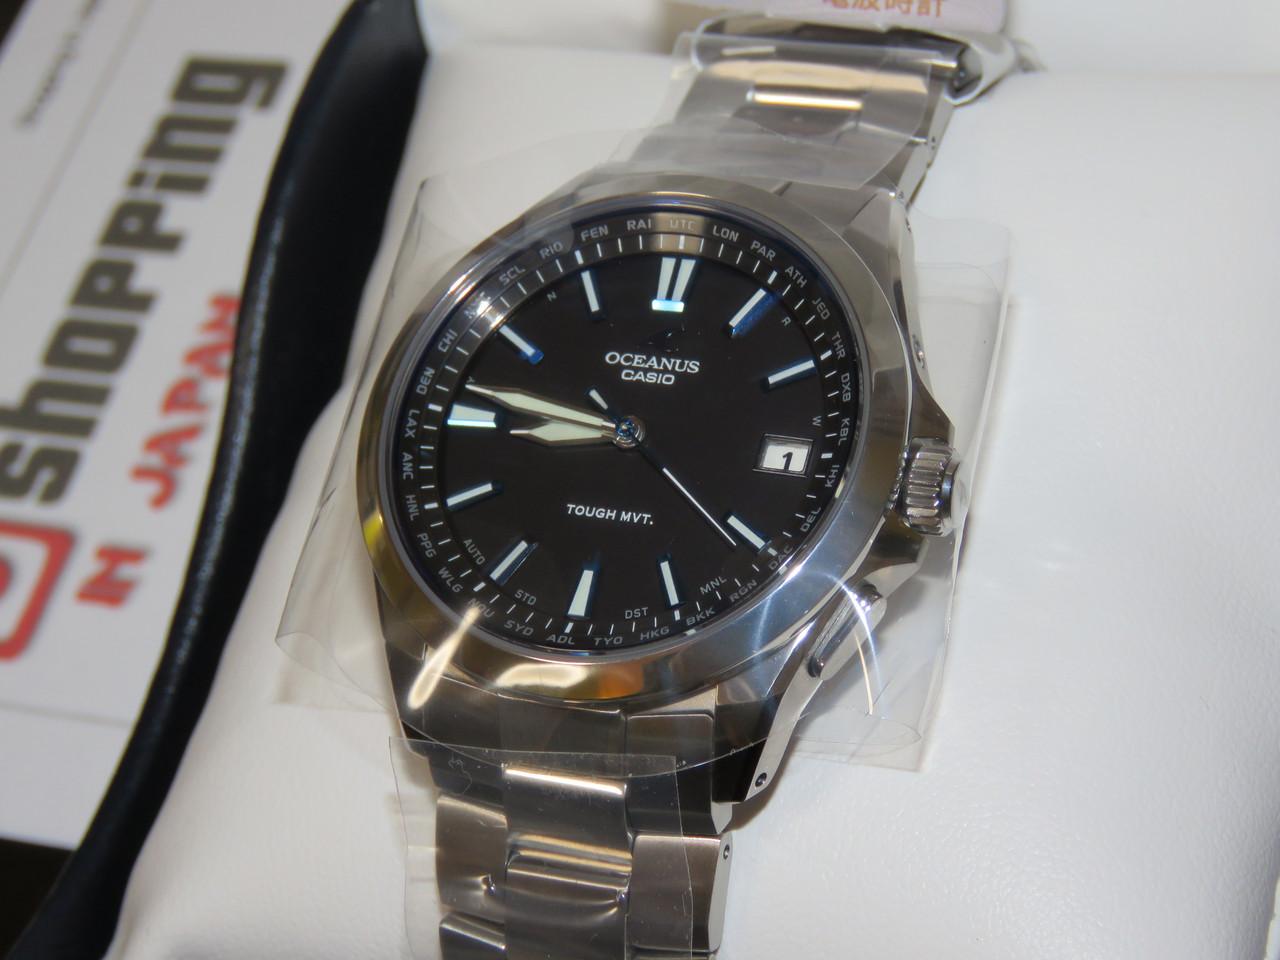 Oceanus OCW-S100-1AJF